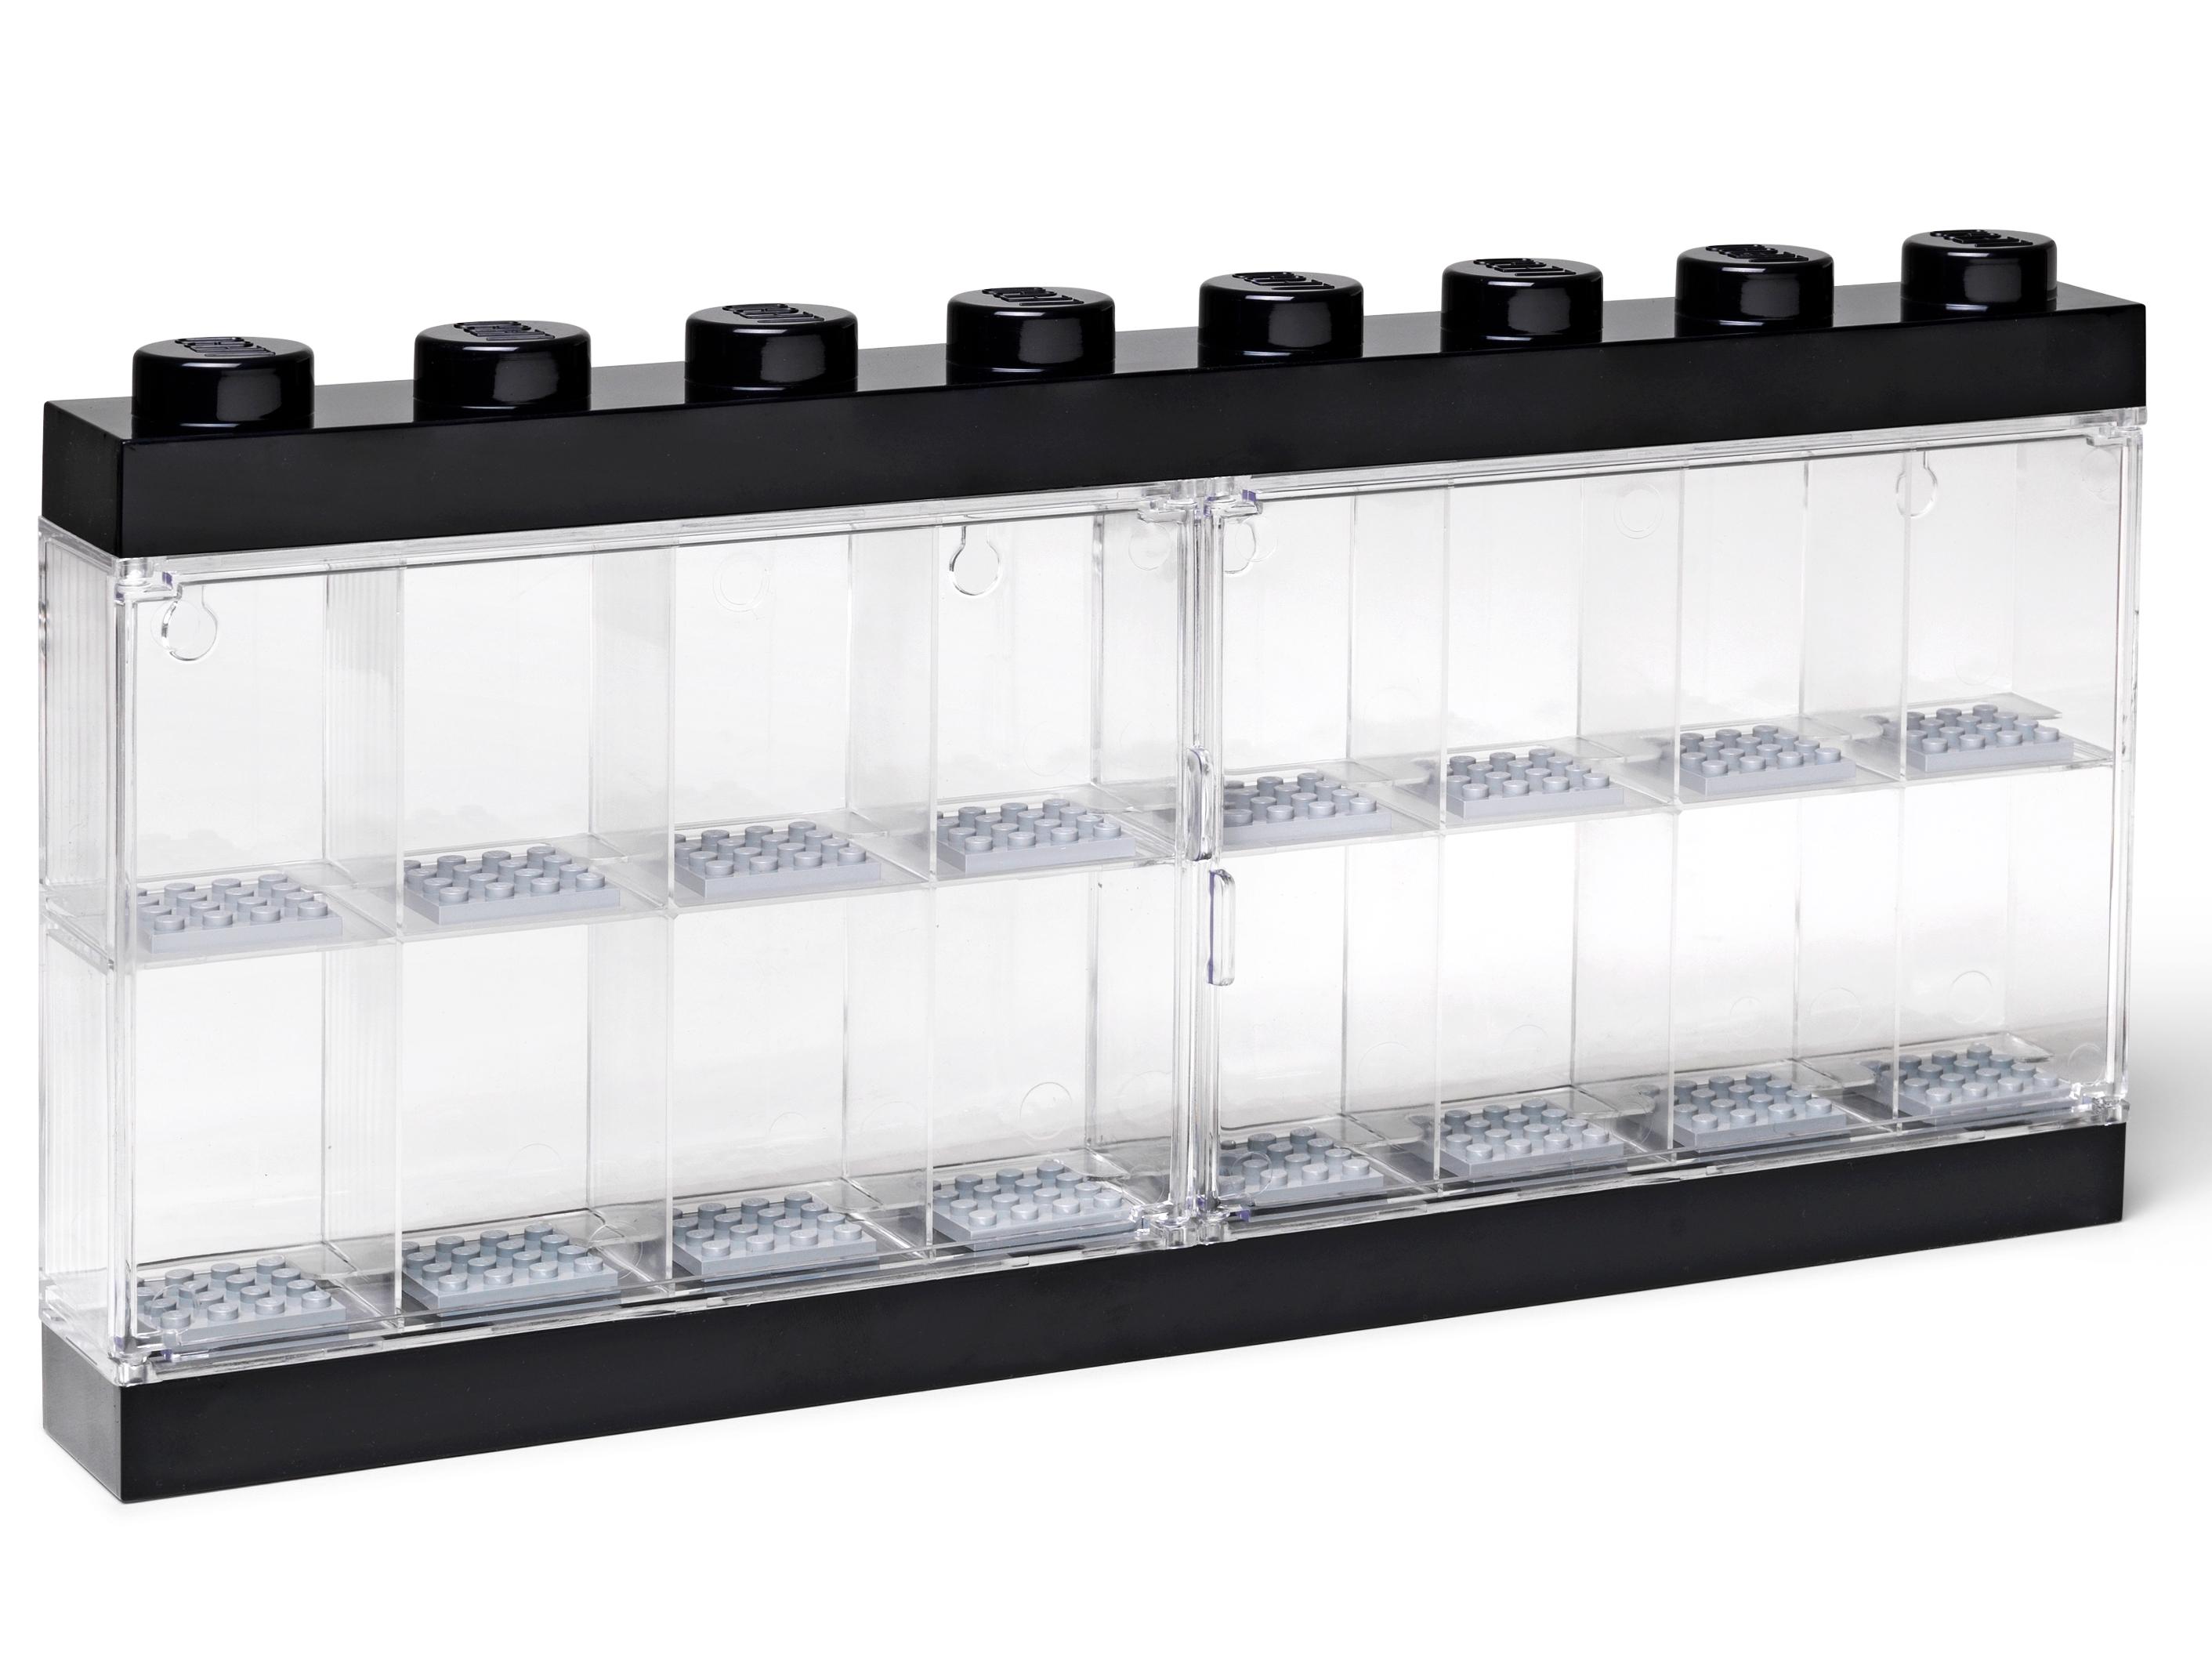 Acrylic stackable Display Case for LEGO Brickheadz double